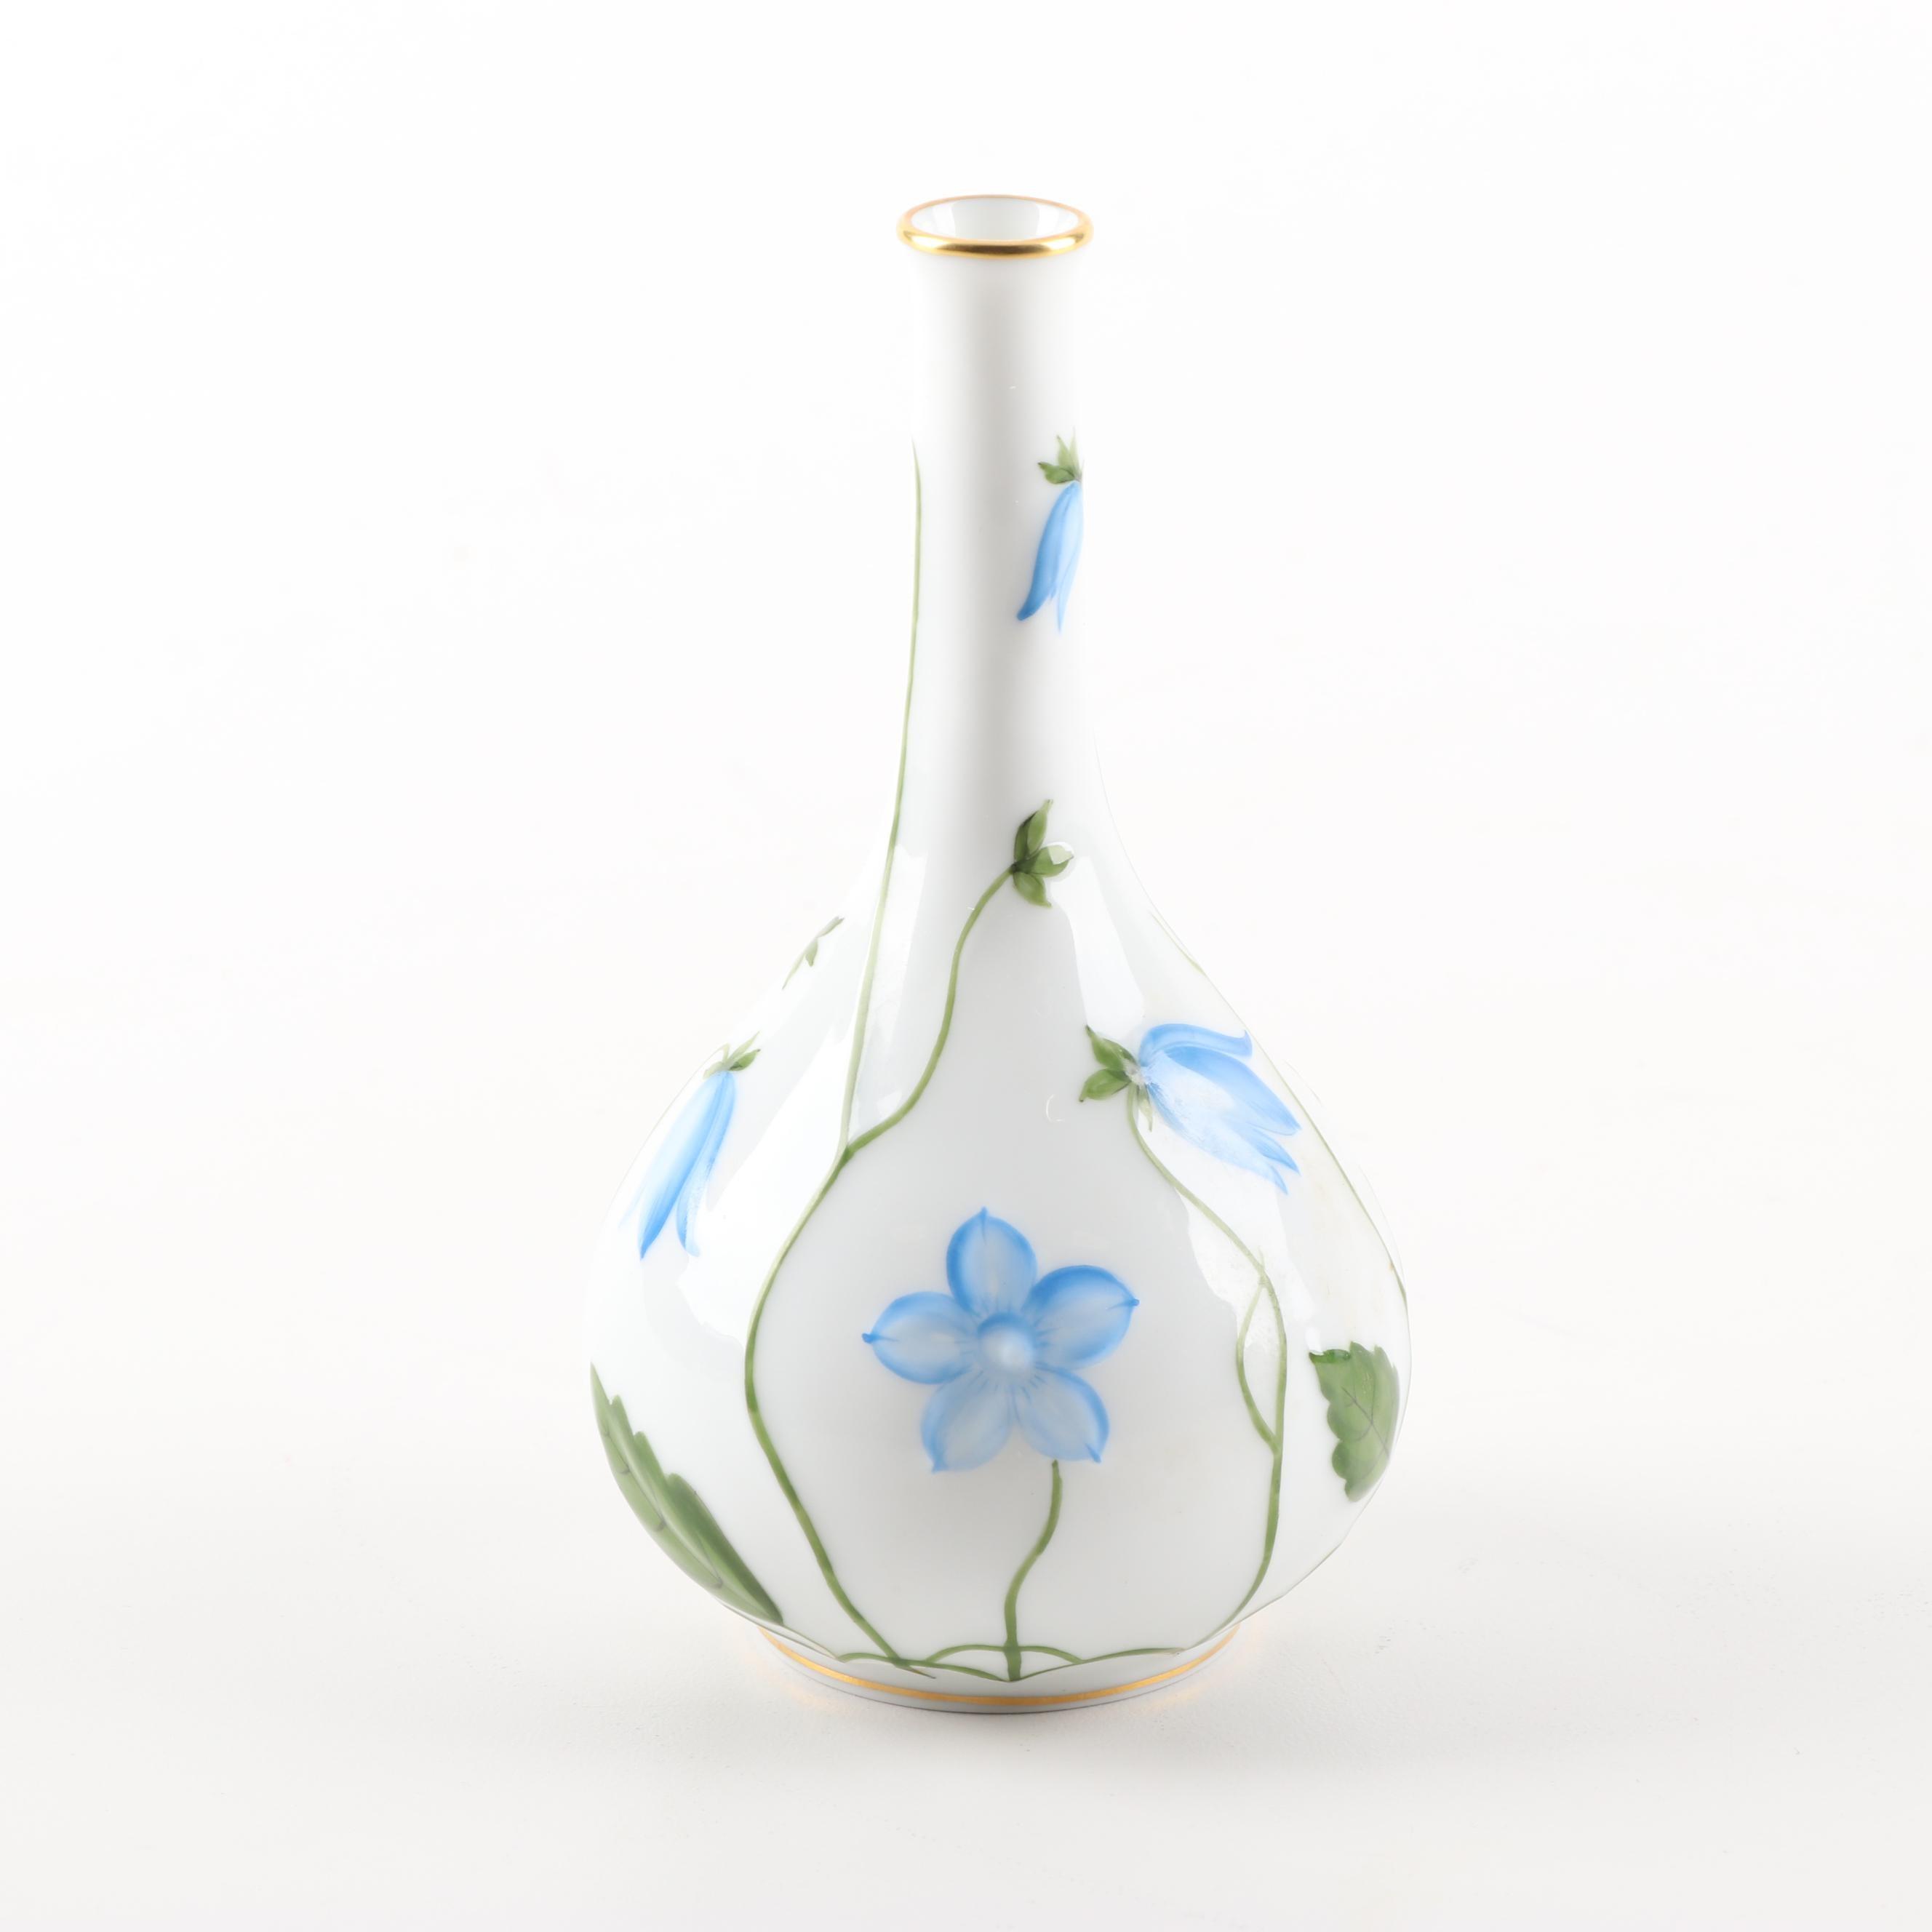 Herend Hand-Painted Blue Floral Bud Vase